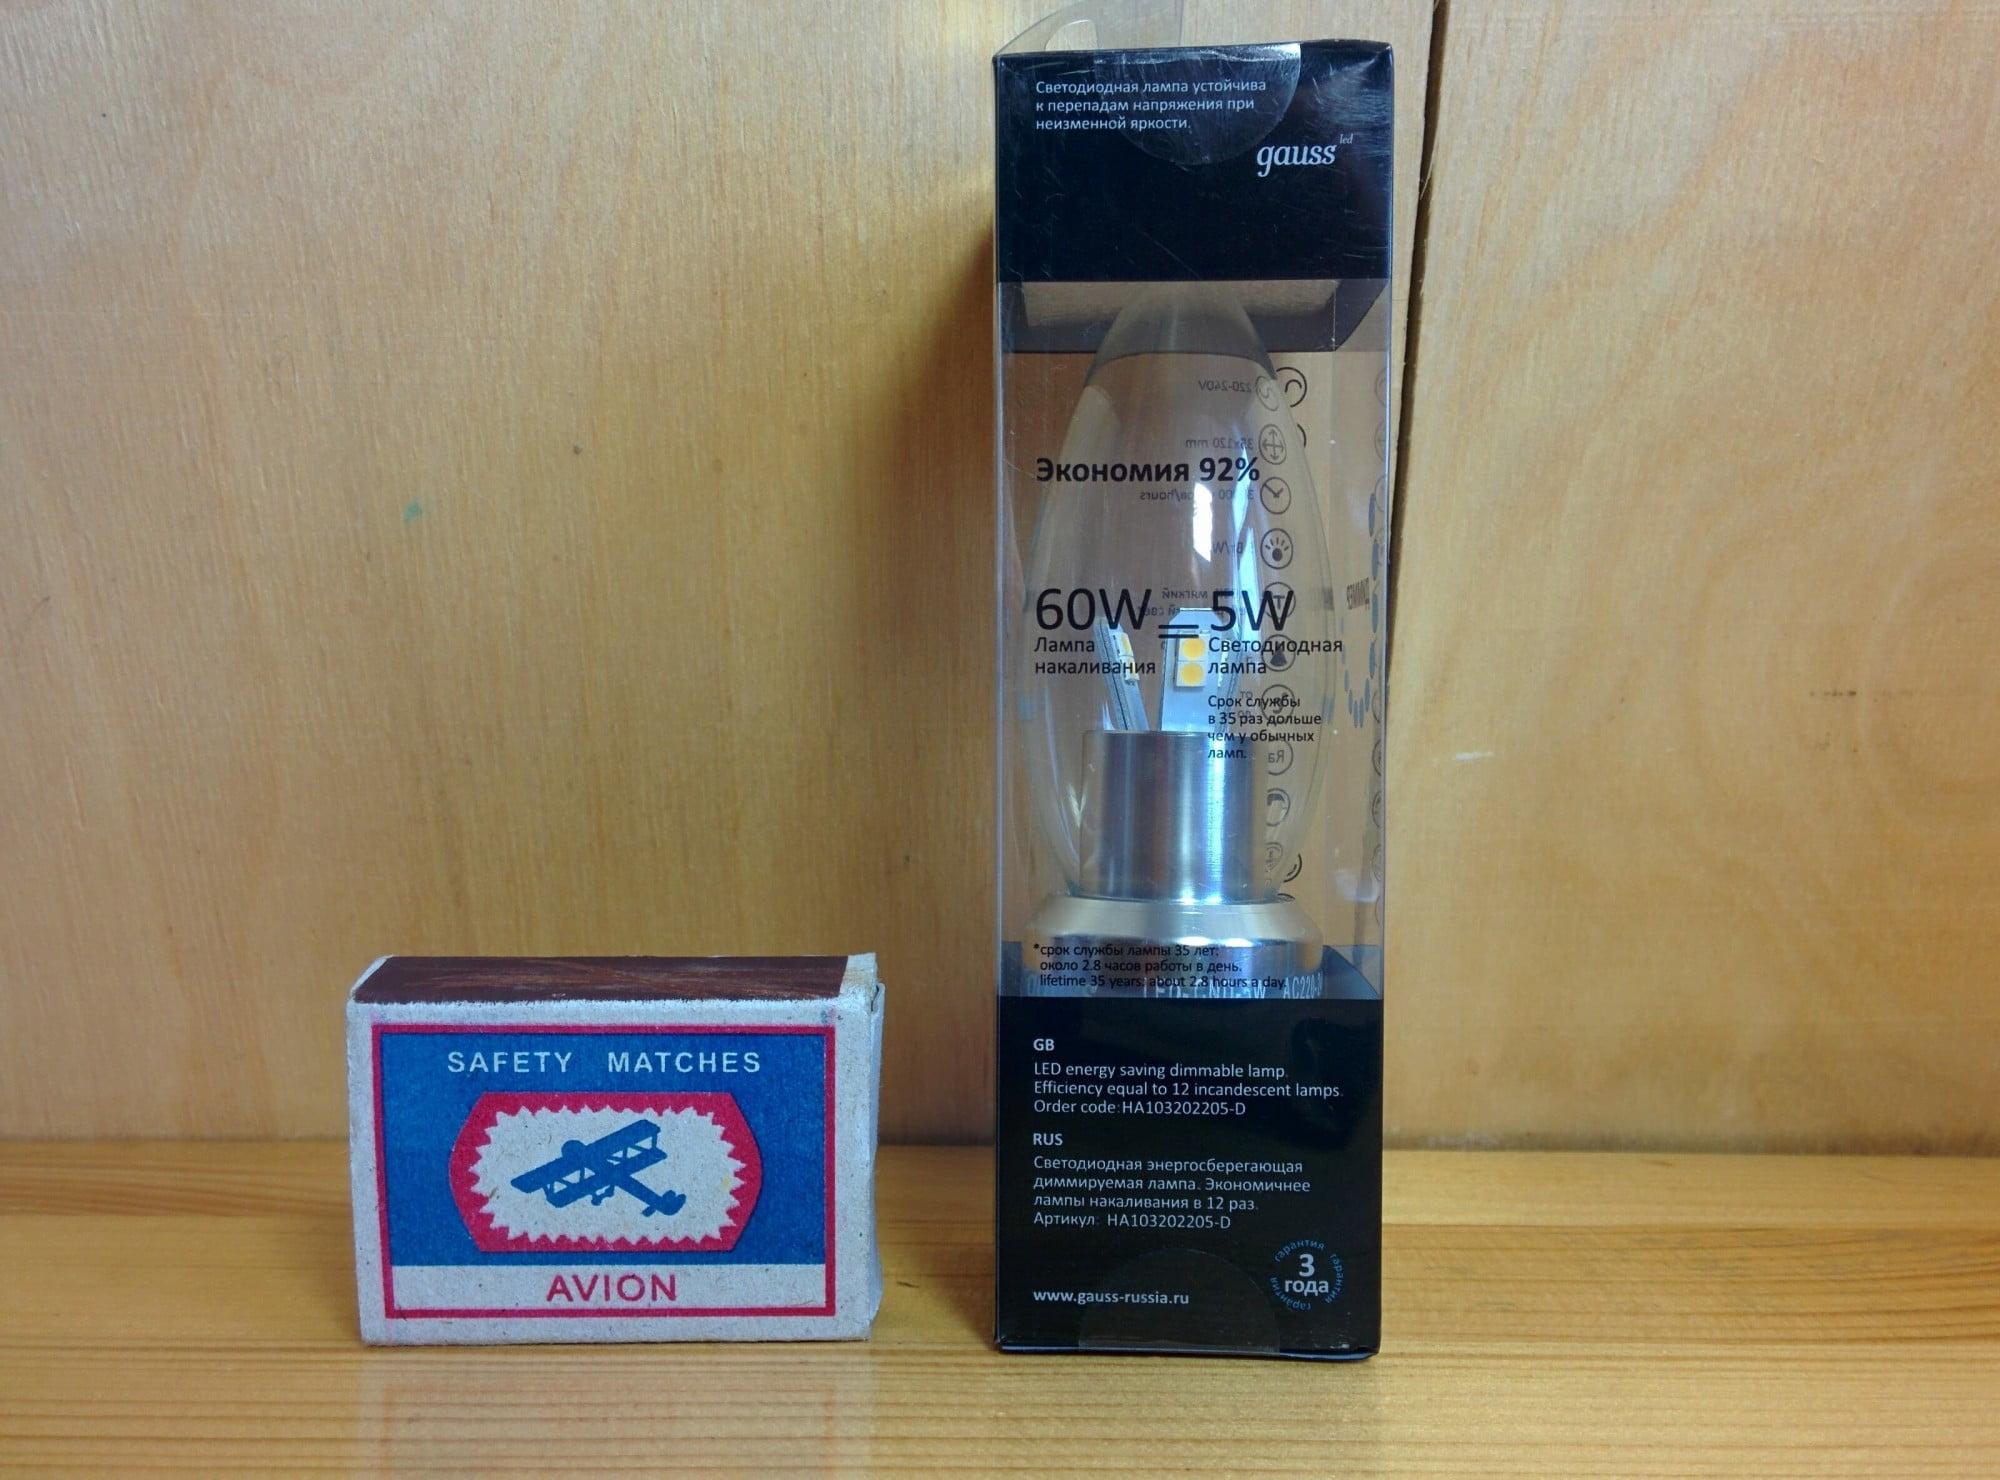 Gauss LED Candle-dim Crystal clear 5W E27 4100K диммируемая характеристики